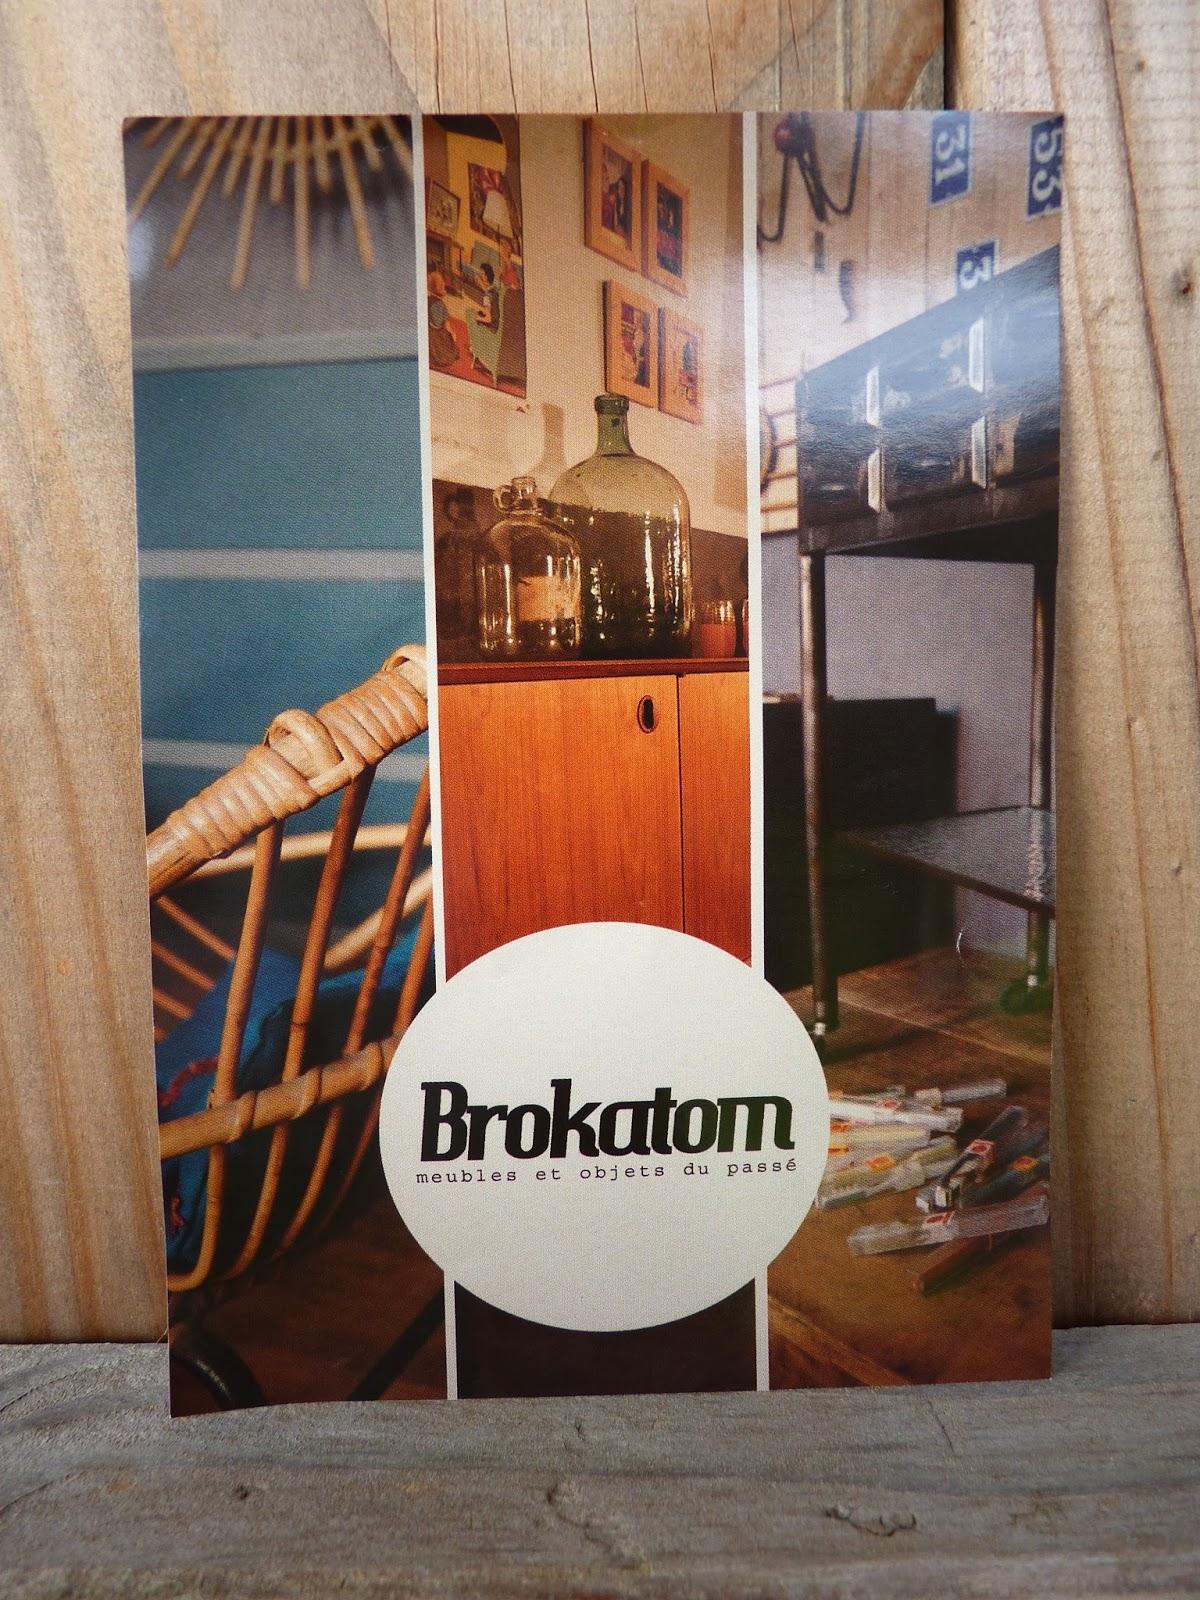 zoline art binz market. Black Bedroom Furniture Sets. Home Design Ideas